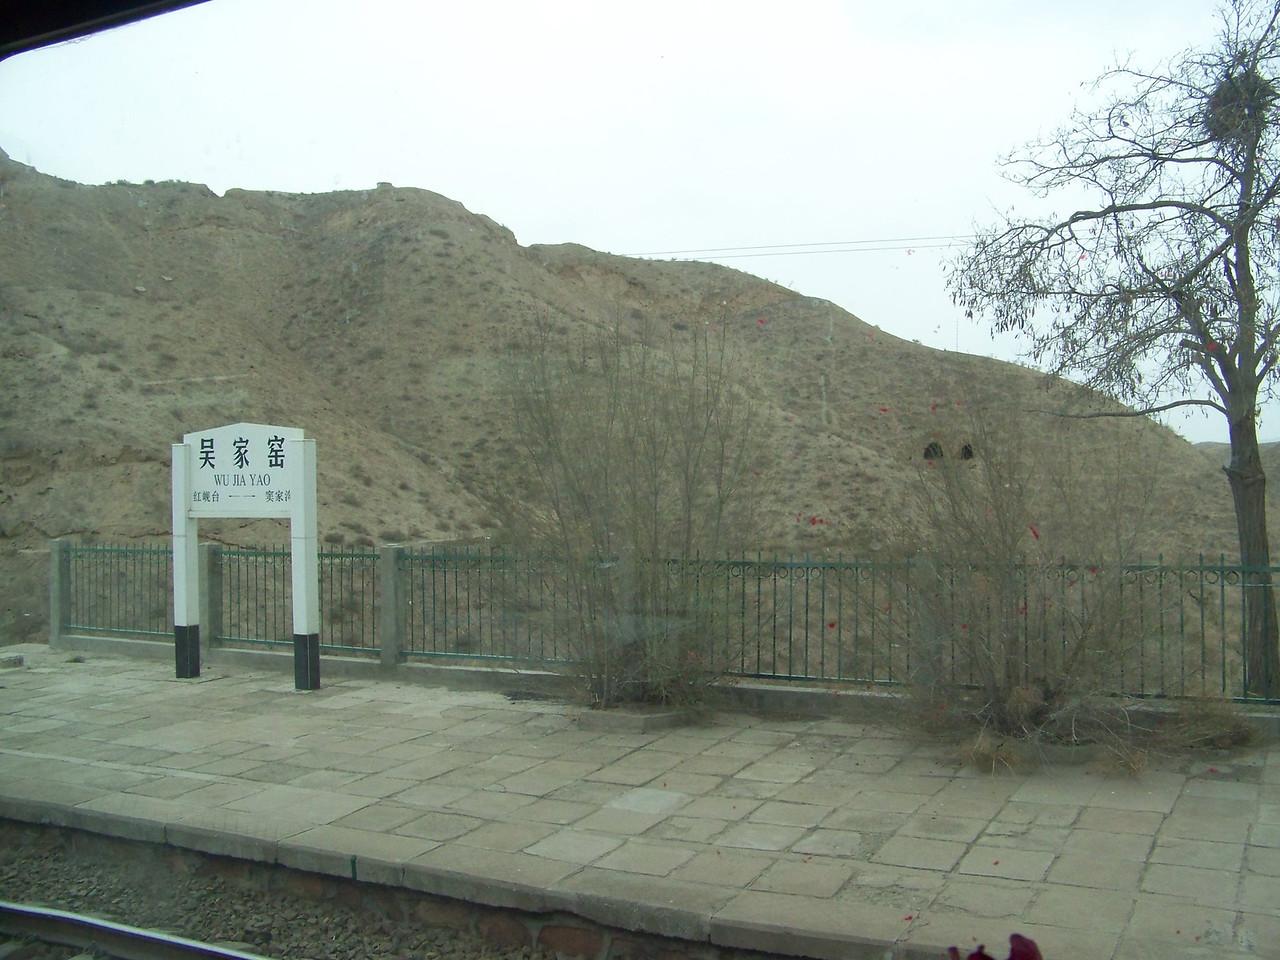 0085 - Wu Jia Yau Station Platform on Train Trip Between Beijing and Lhasa.JPG